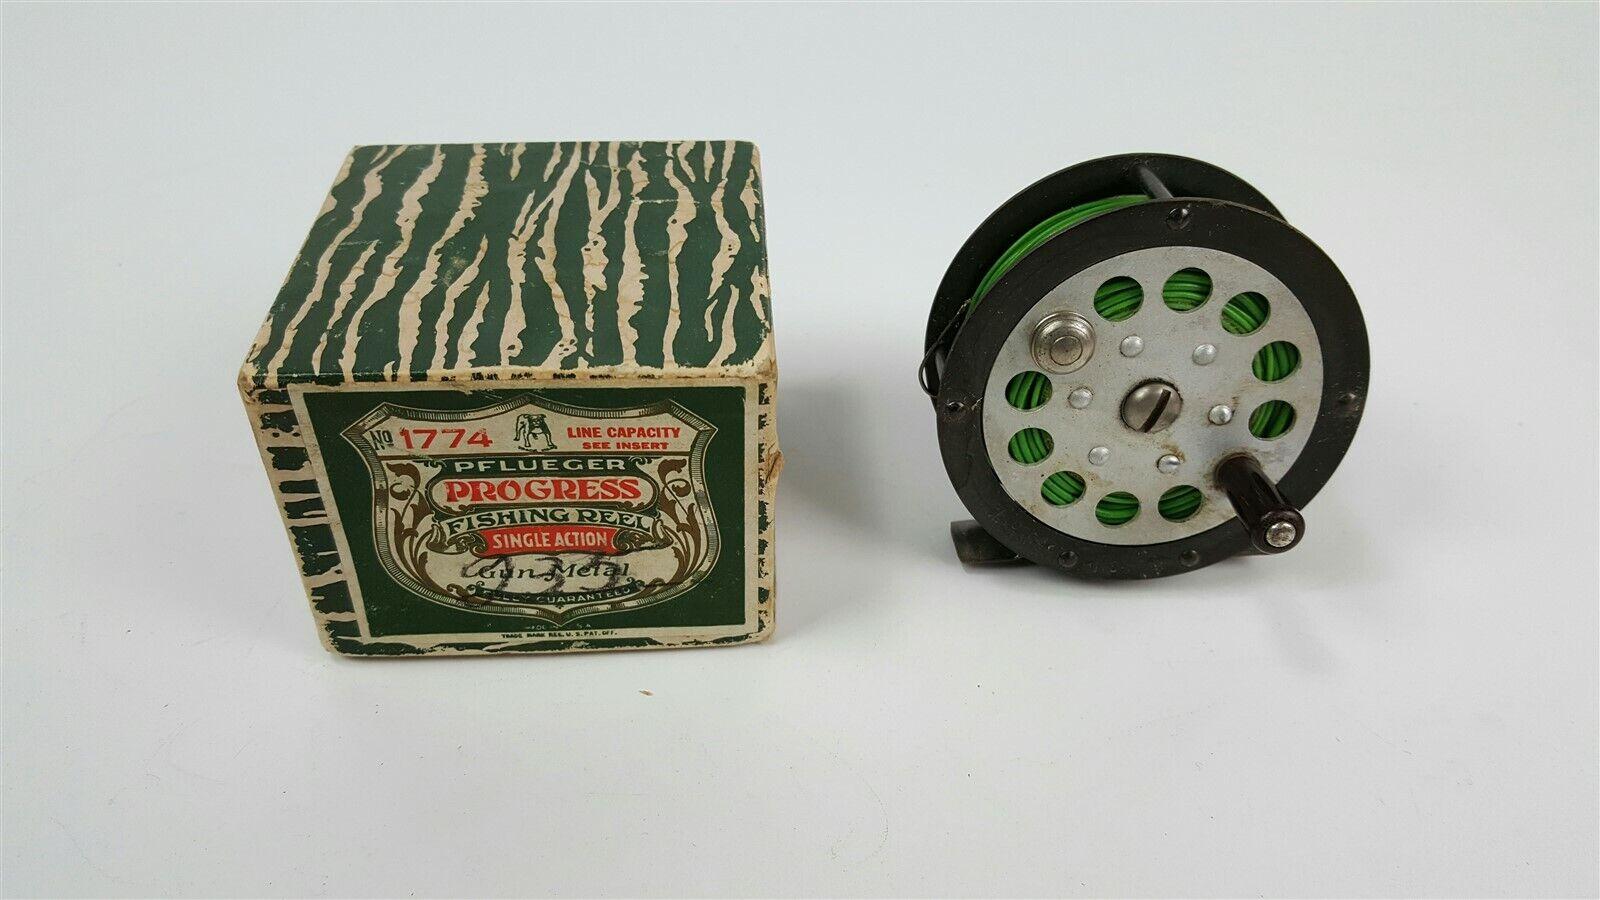 Vintage Pflueger Progress 1774 Angeltrommel in Box